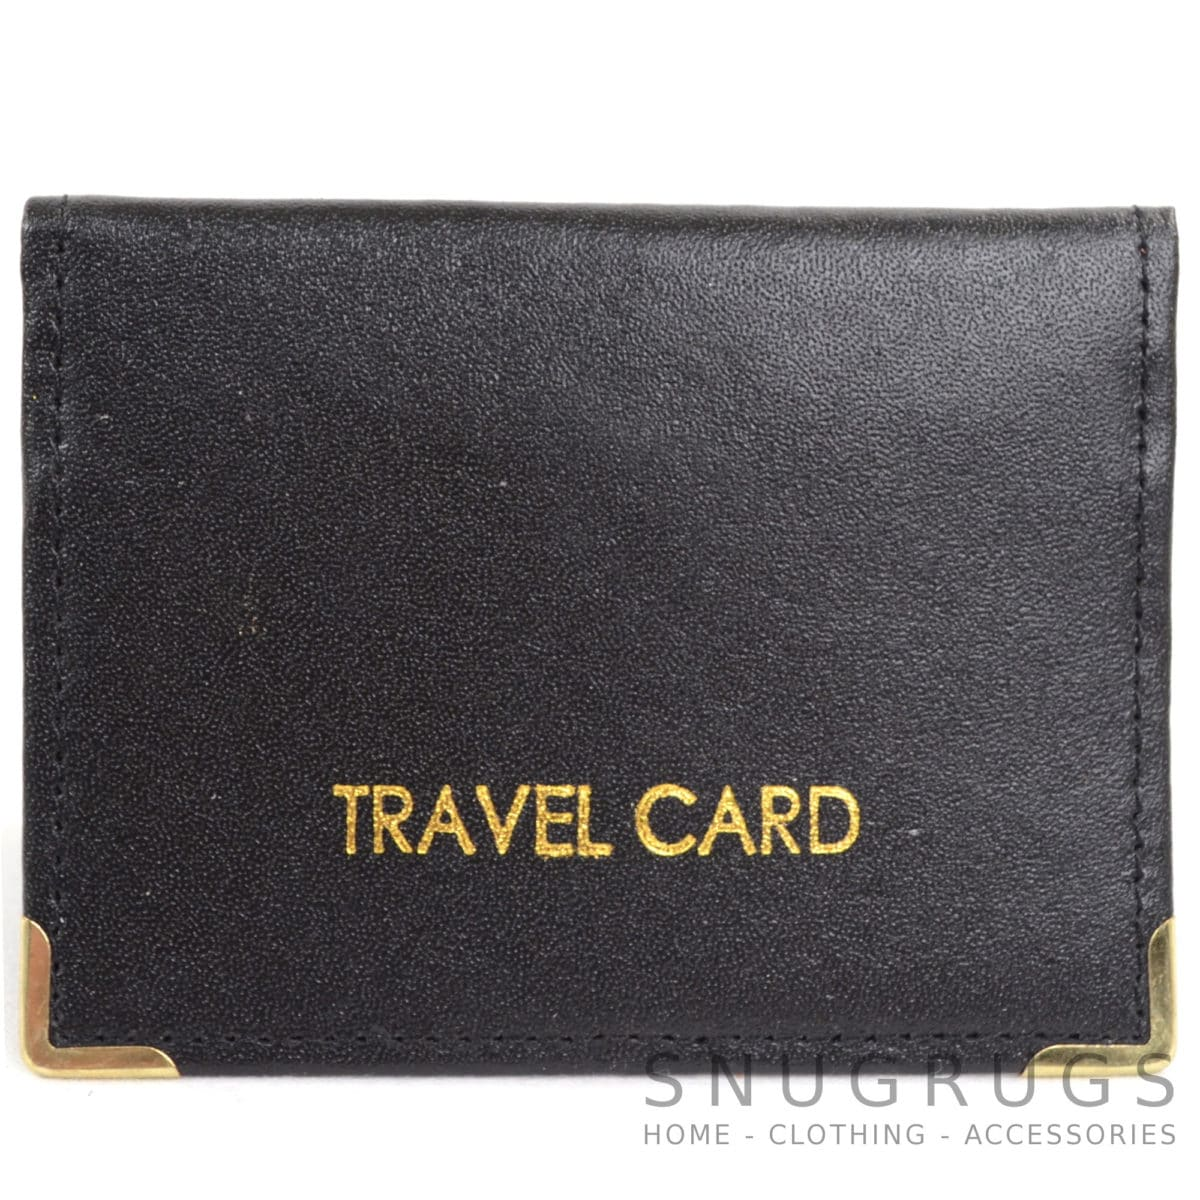 Leather Travel Card / ID / Credit Card Holder - Black